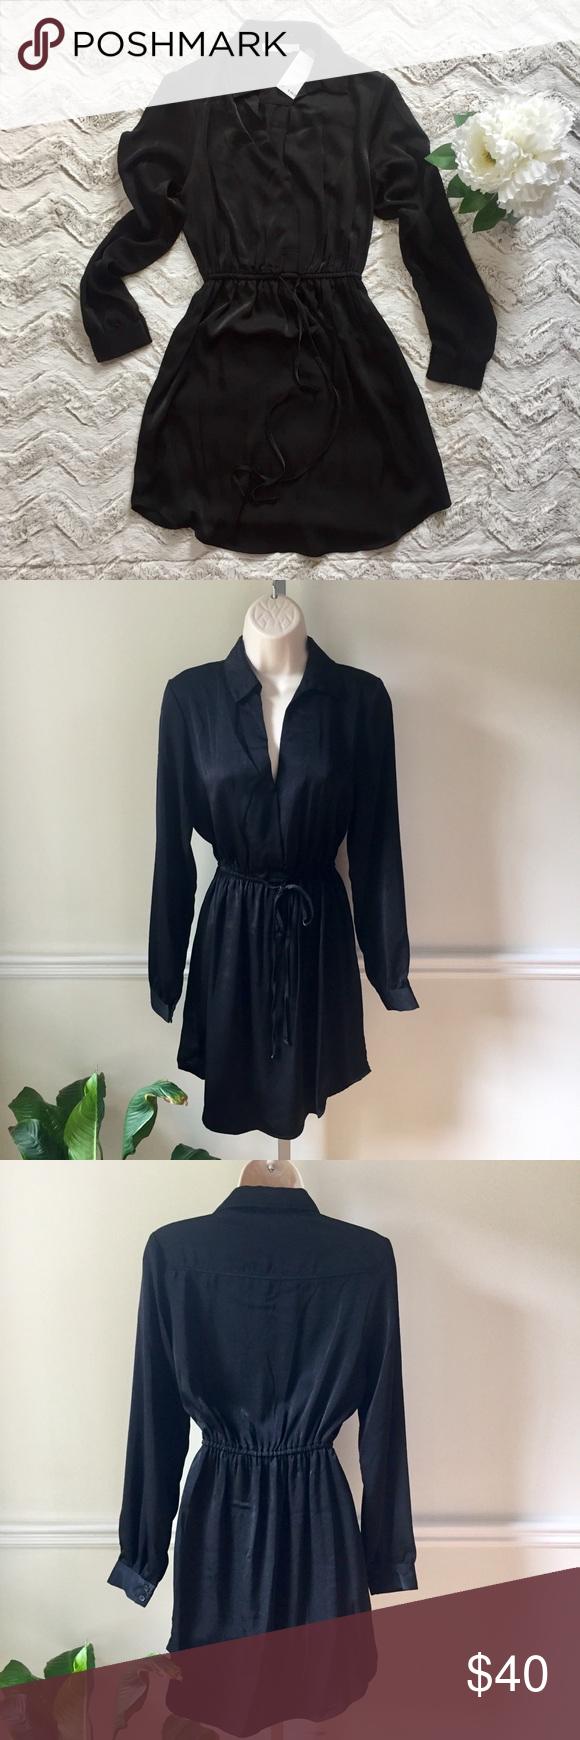 New nwt lush little black dress silky long sleeve nwt in my